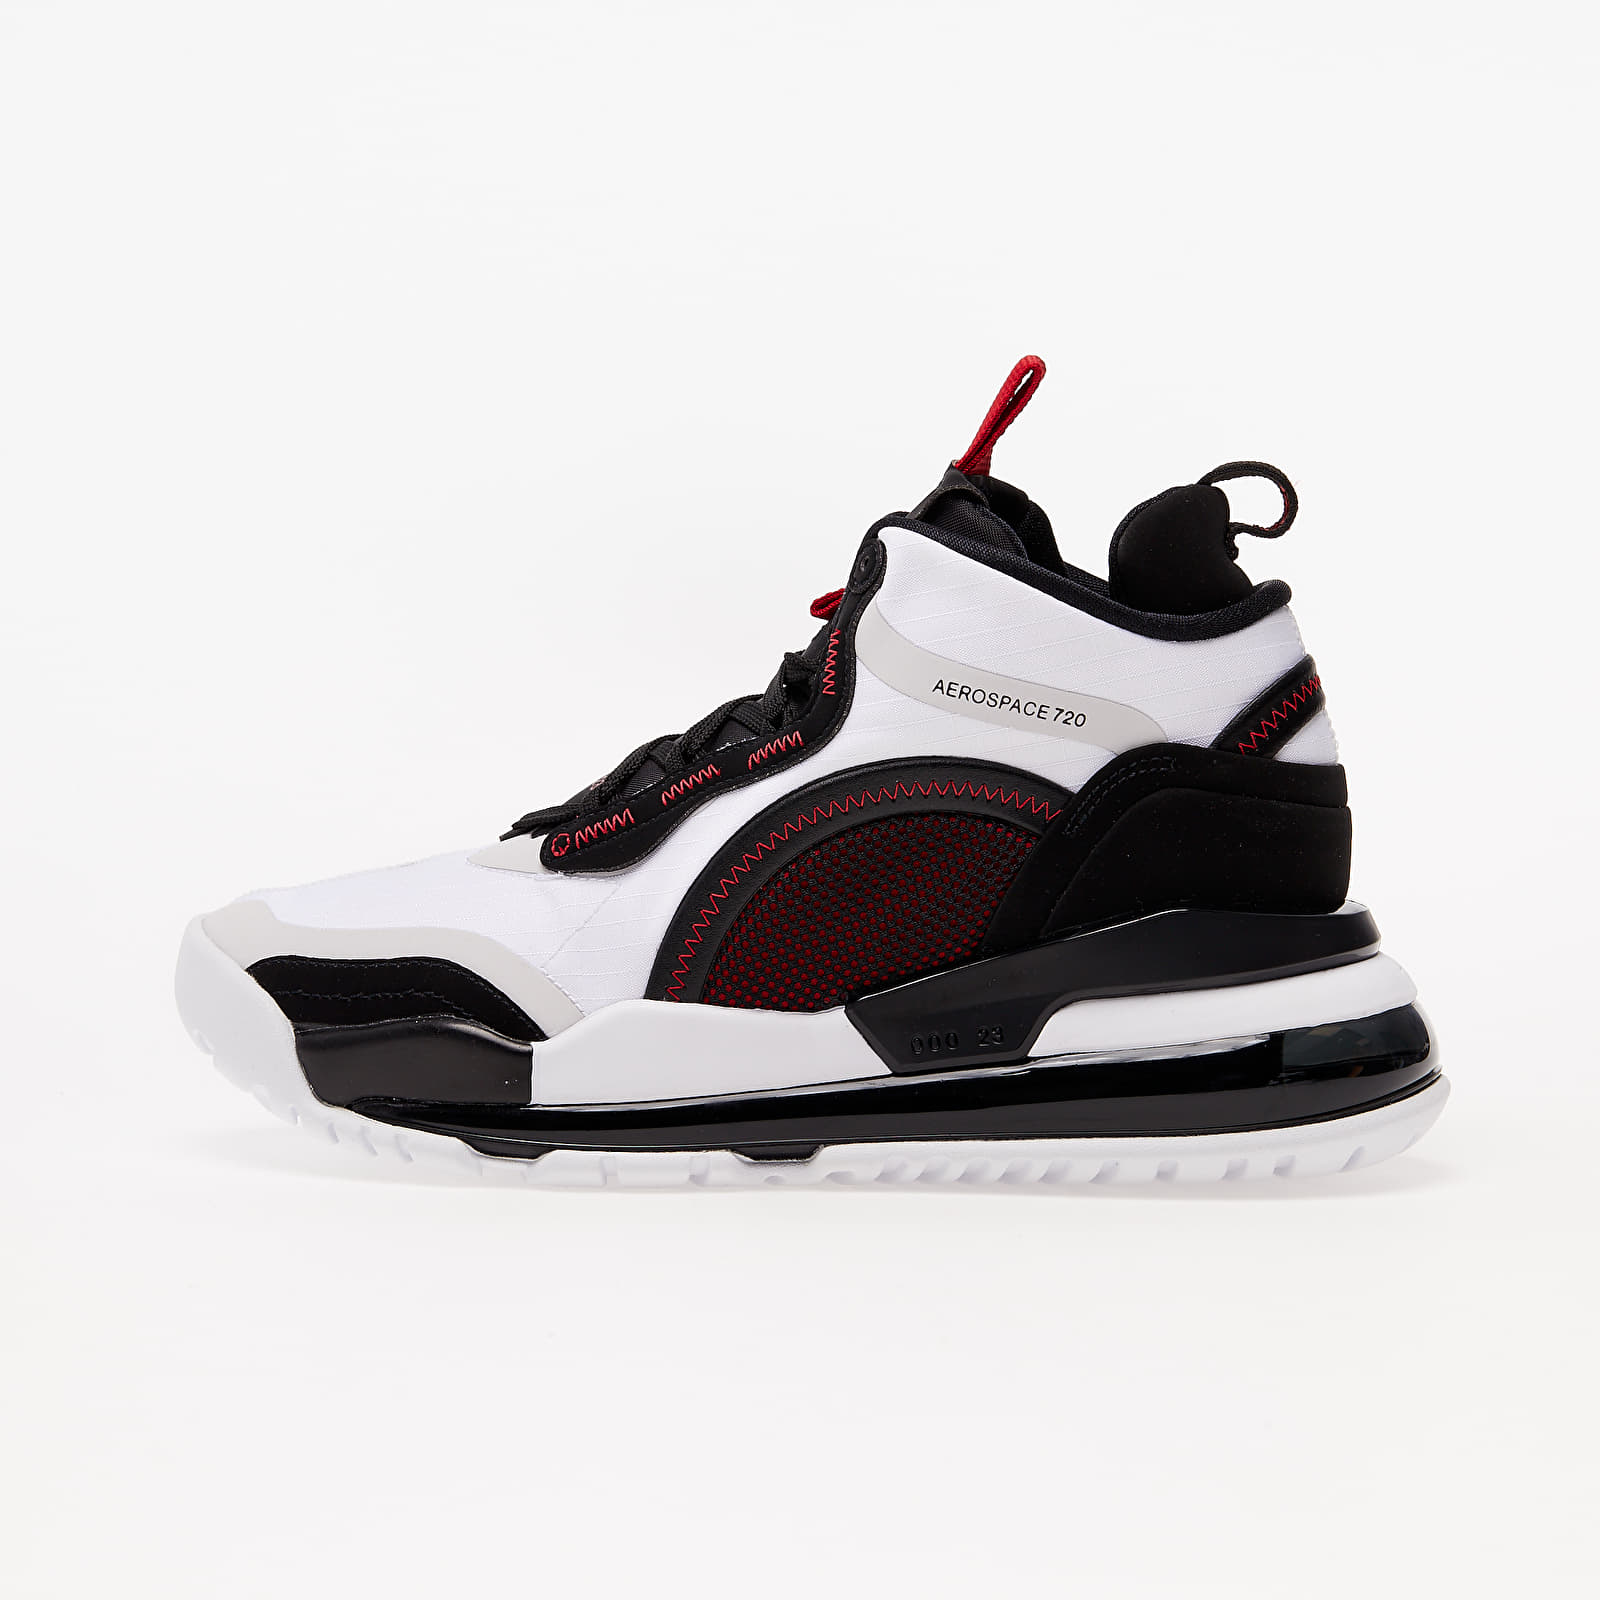 Pánské tenisky a boty Jordan Aerospace 720 White/ Gym Red-Black-Vast Grey